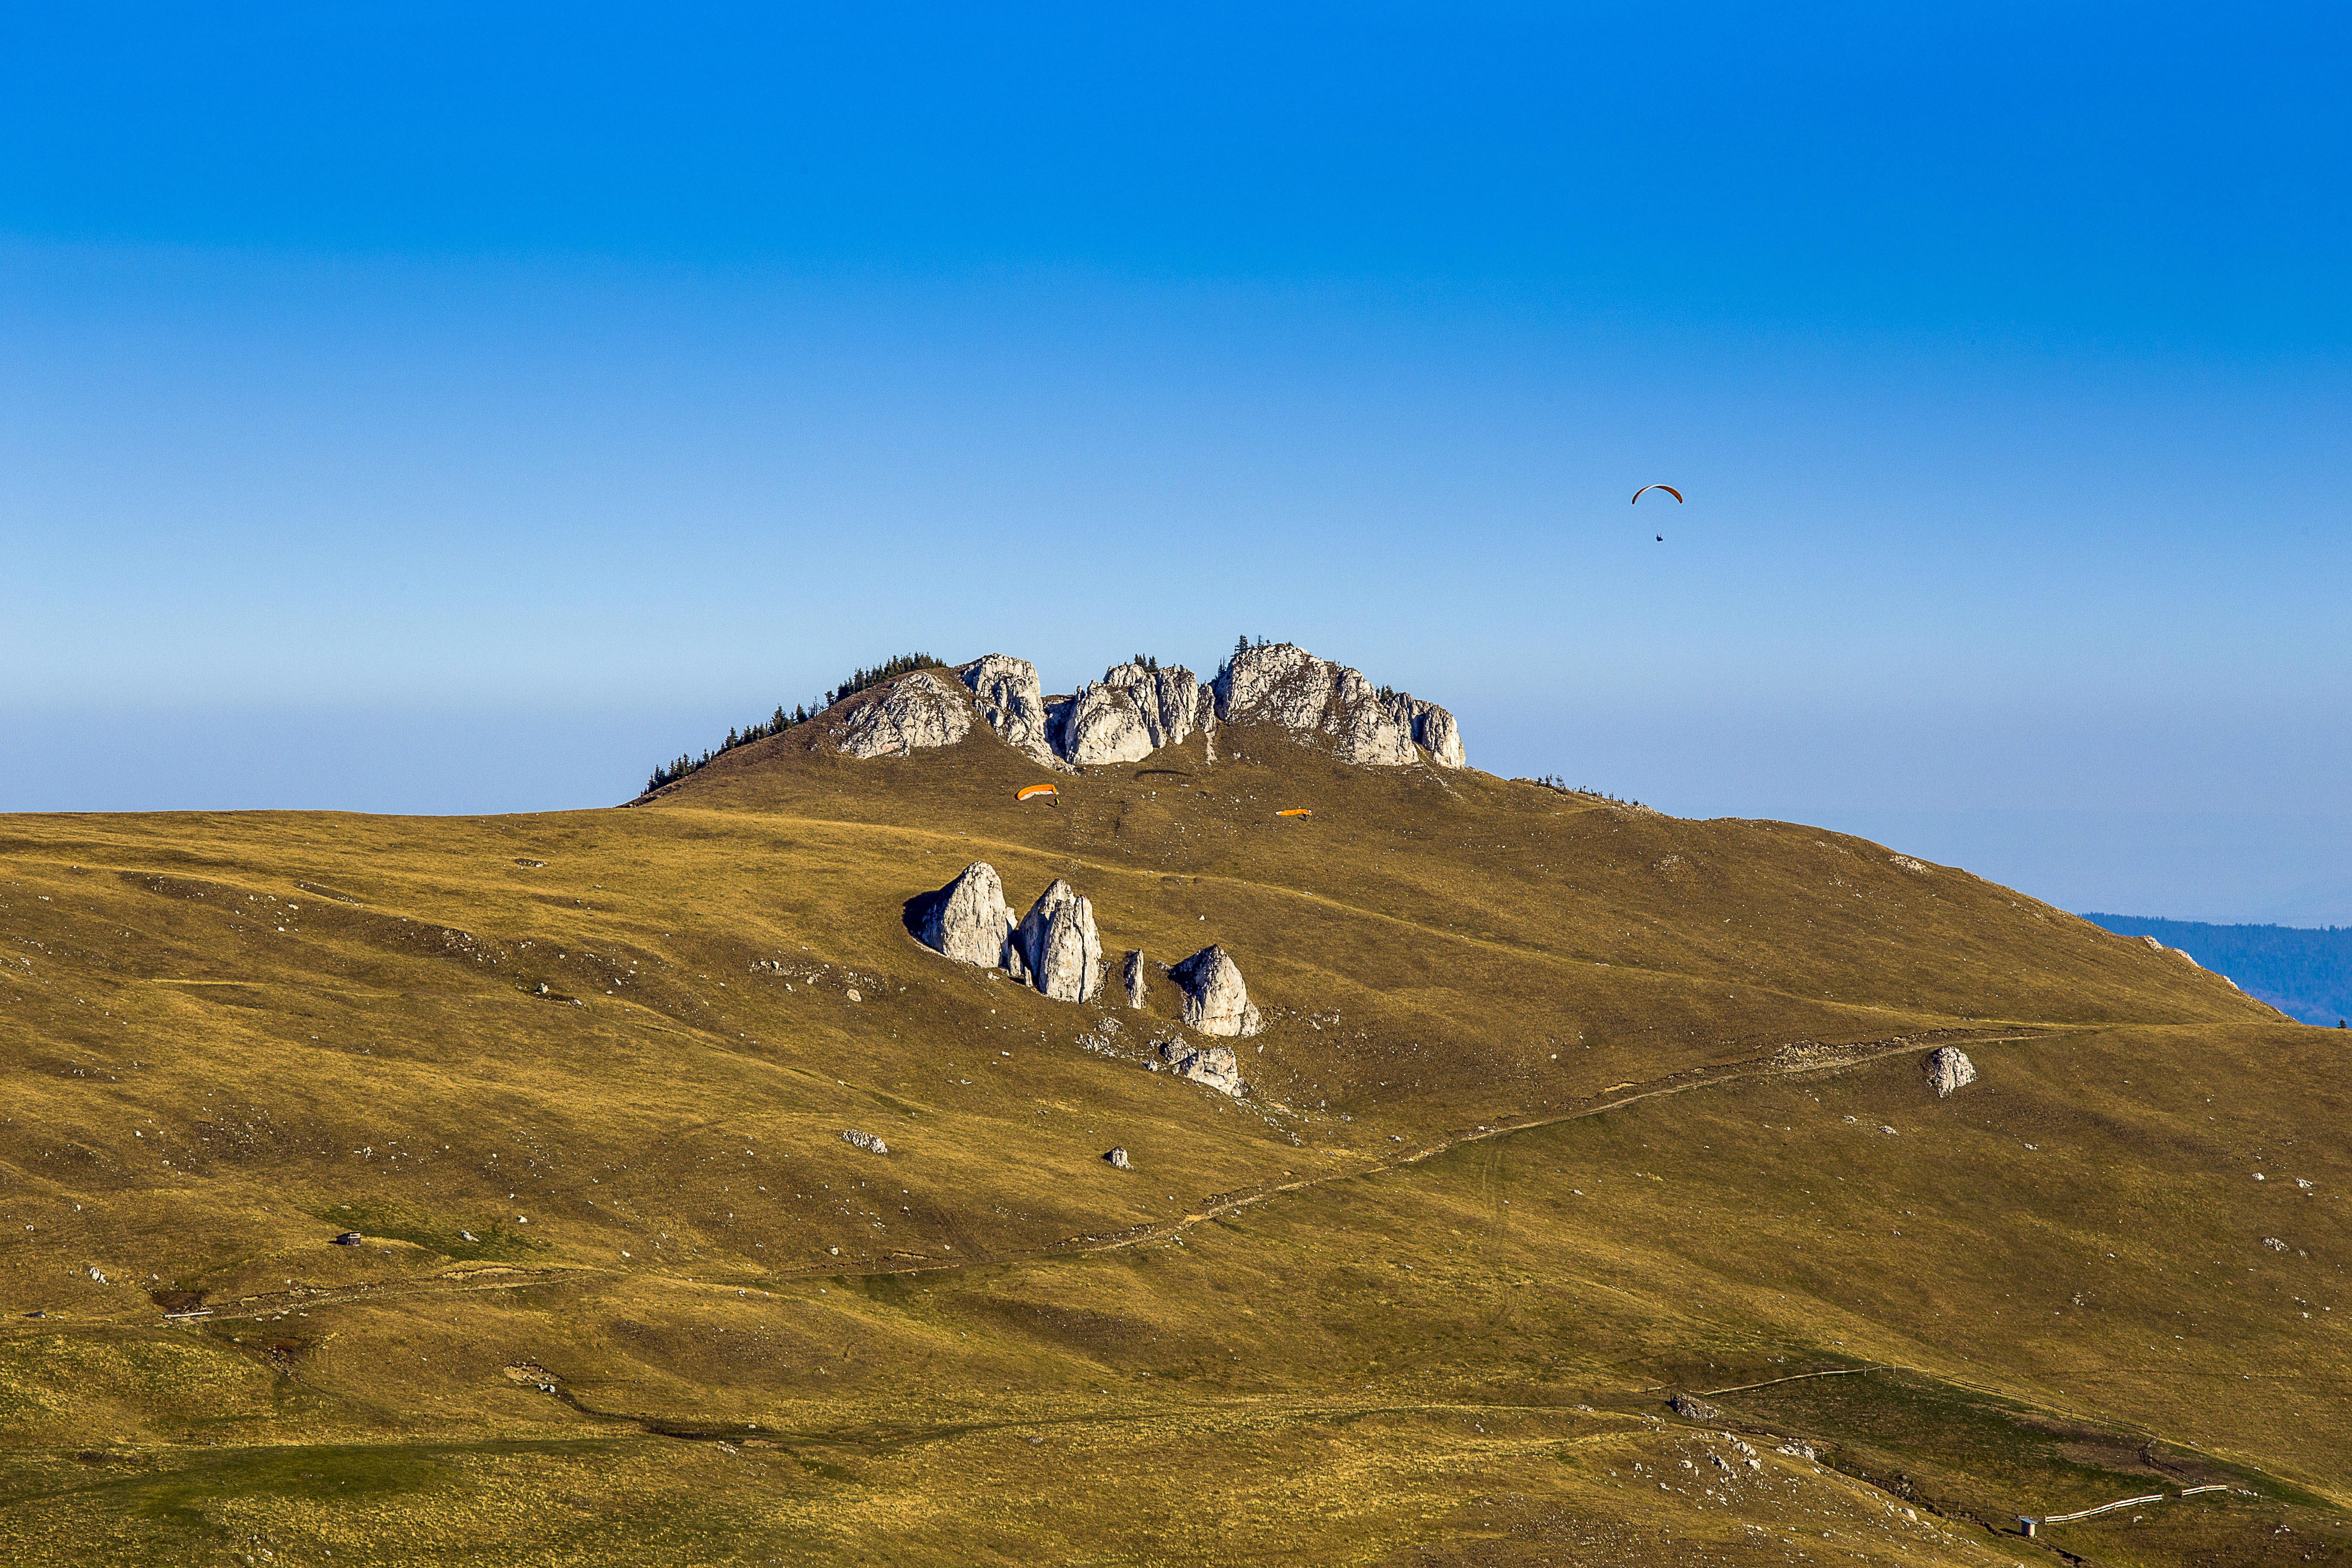 Mountain and Hill landscape in bucovina Romania.